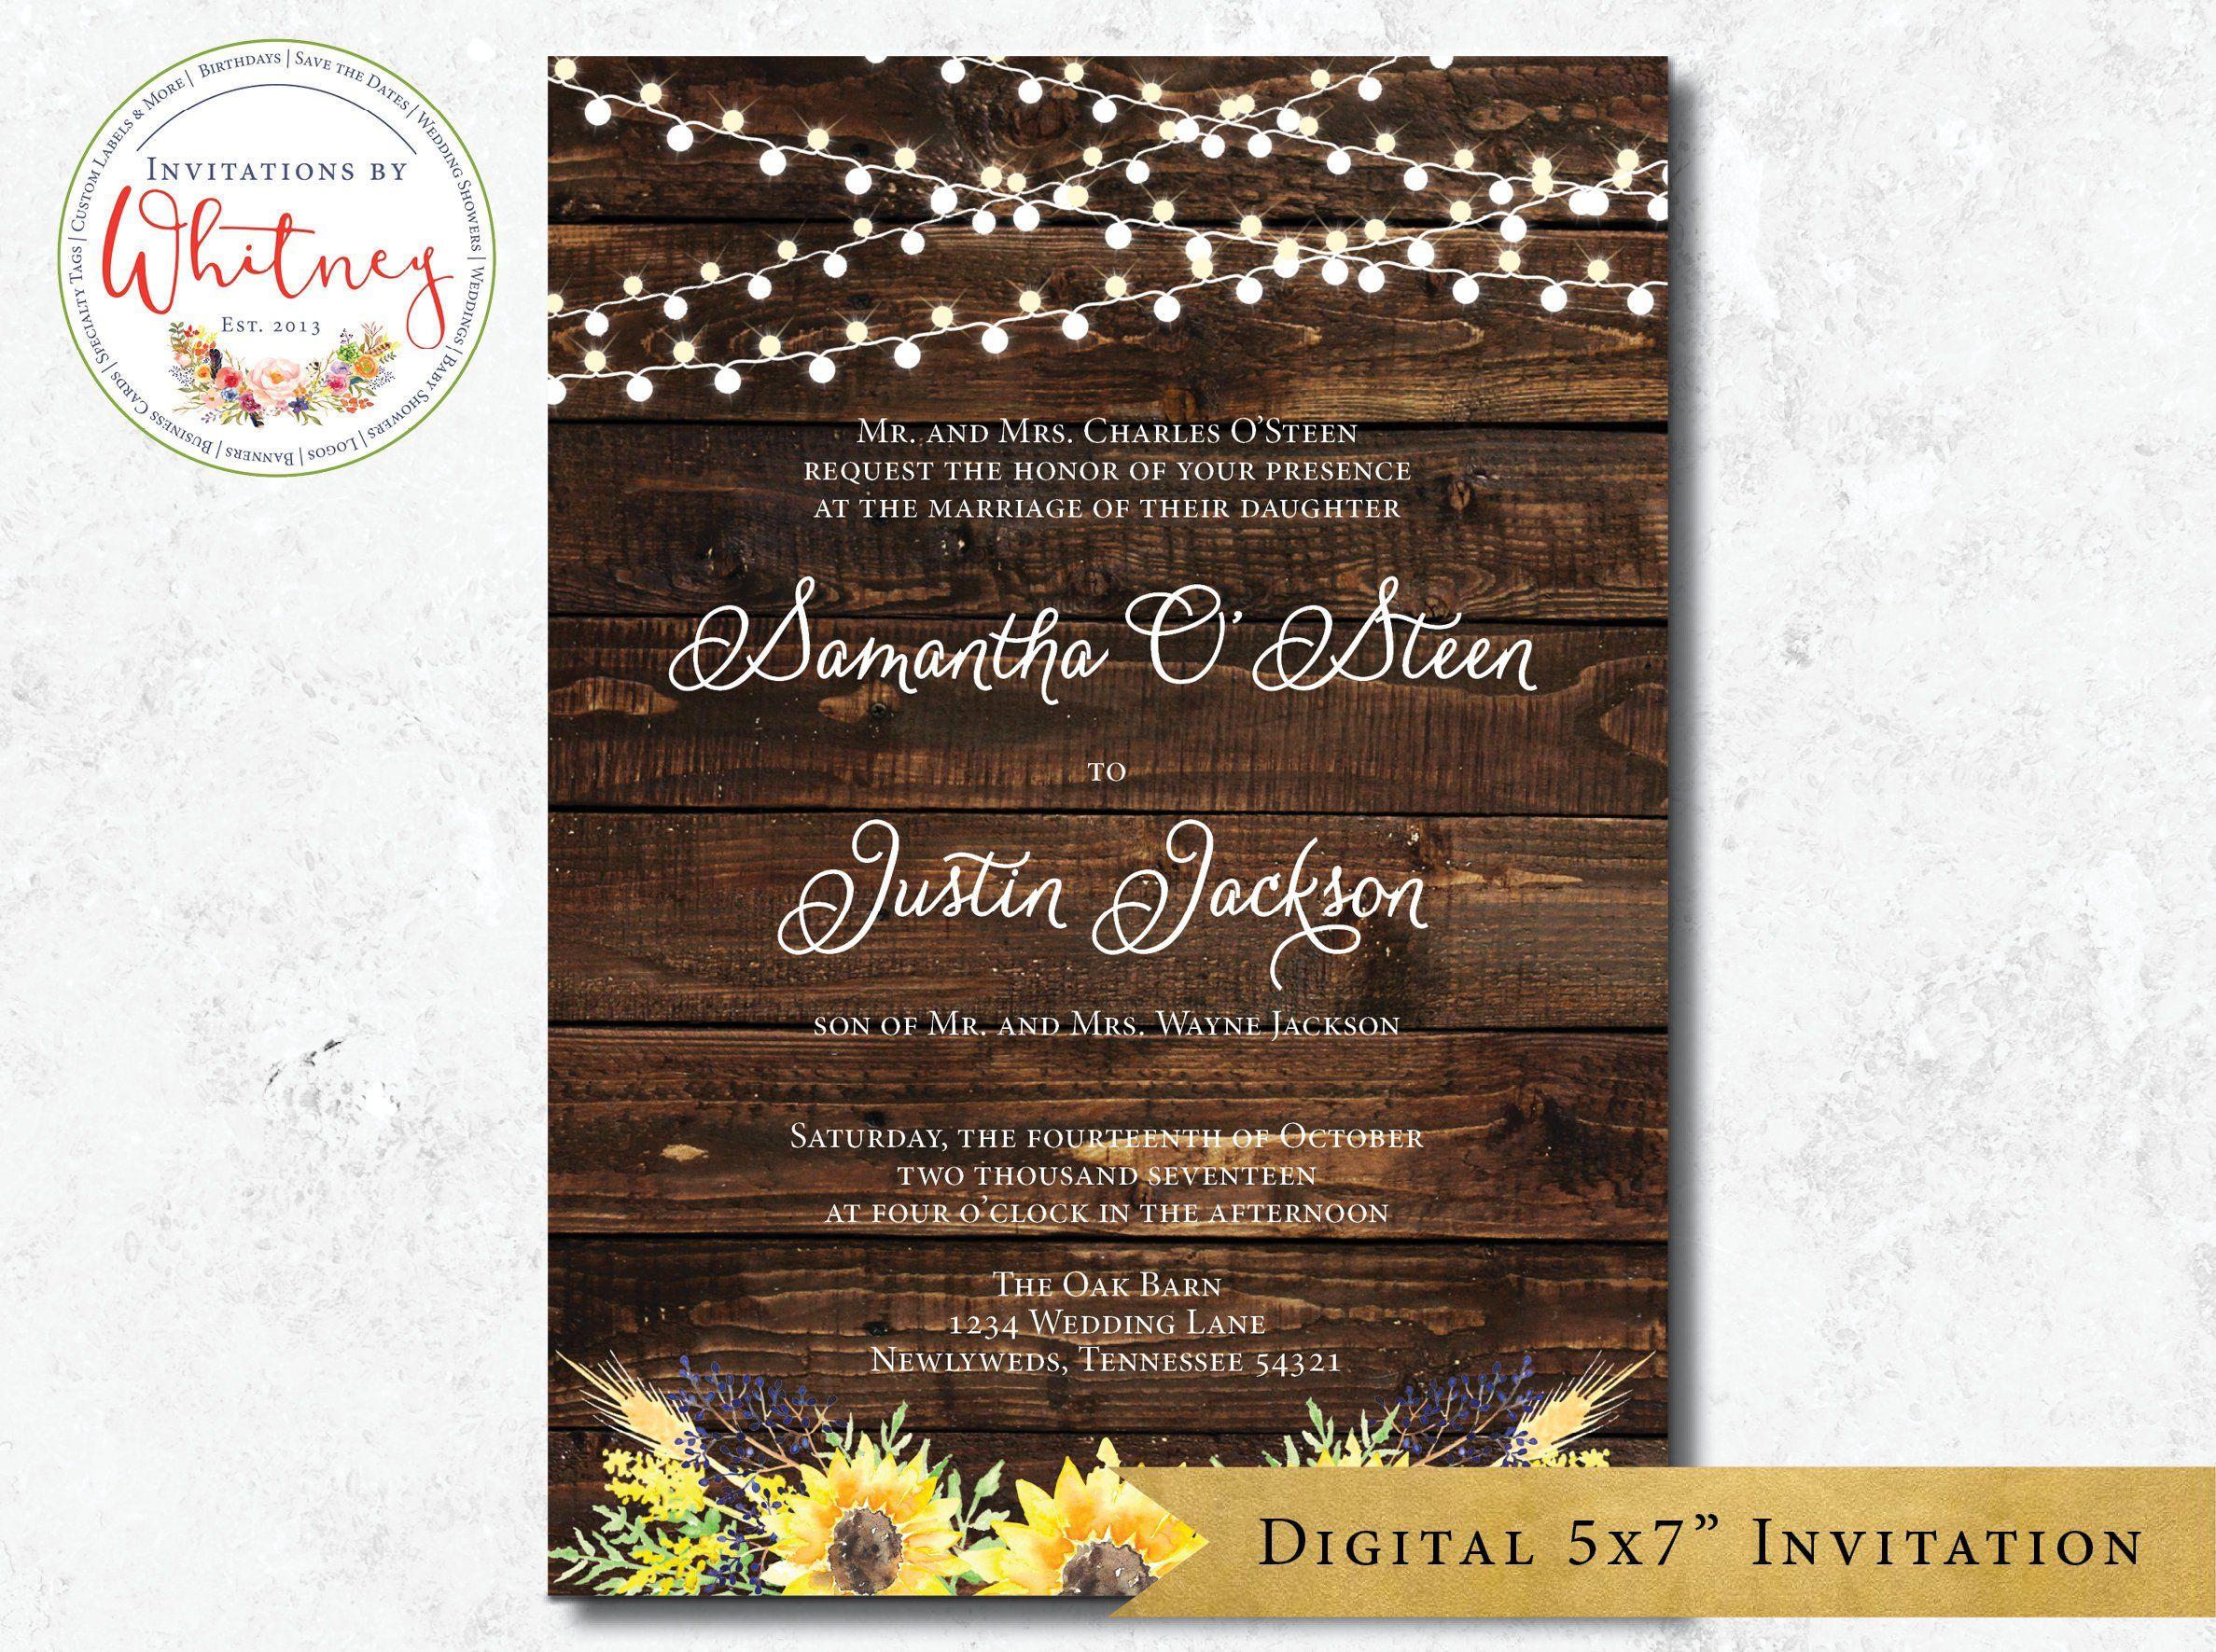 Sunflower Wedding Invitation Rustic Wedding Invitation Etsy Wedding Invitations Rustic Sunflower Wedding Invitations Etsy Wedding Invitations